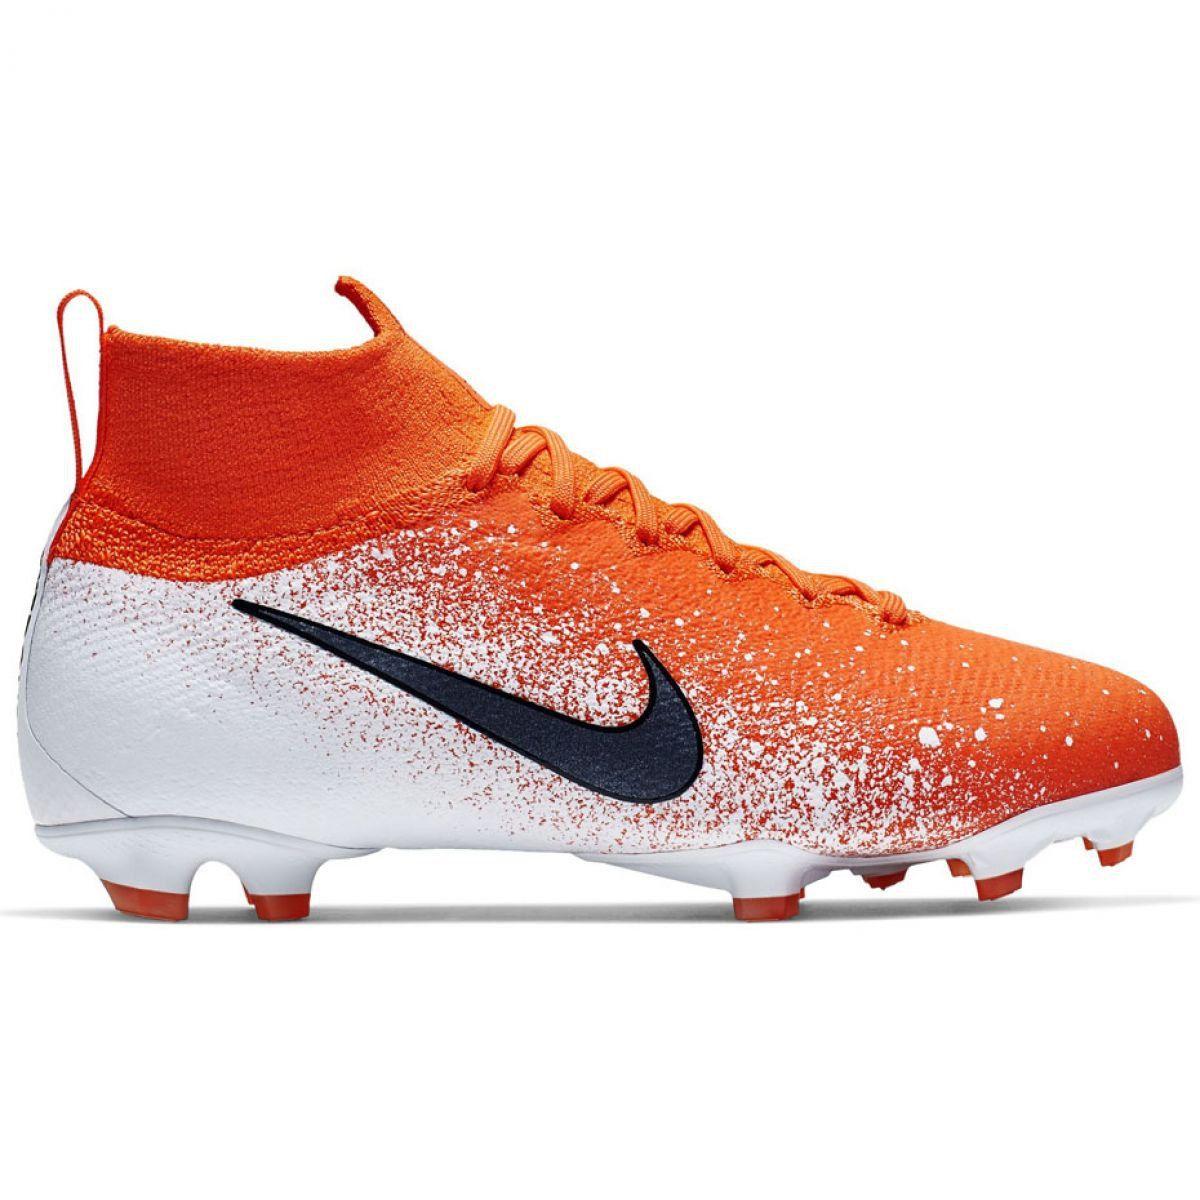 Buty Pilkarskie Nike Mercurial Superfly 6 Elite Fg Jr Ah7340 801 Czerwone Wielokolorowe Football Shoes Nike Nike Shoes